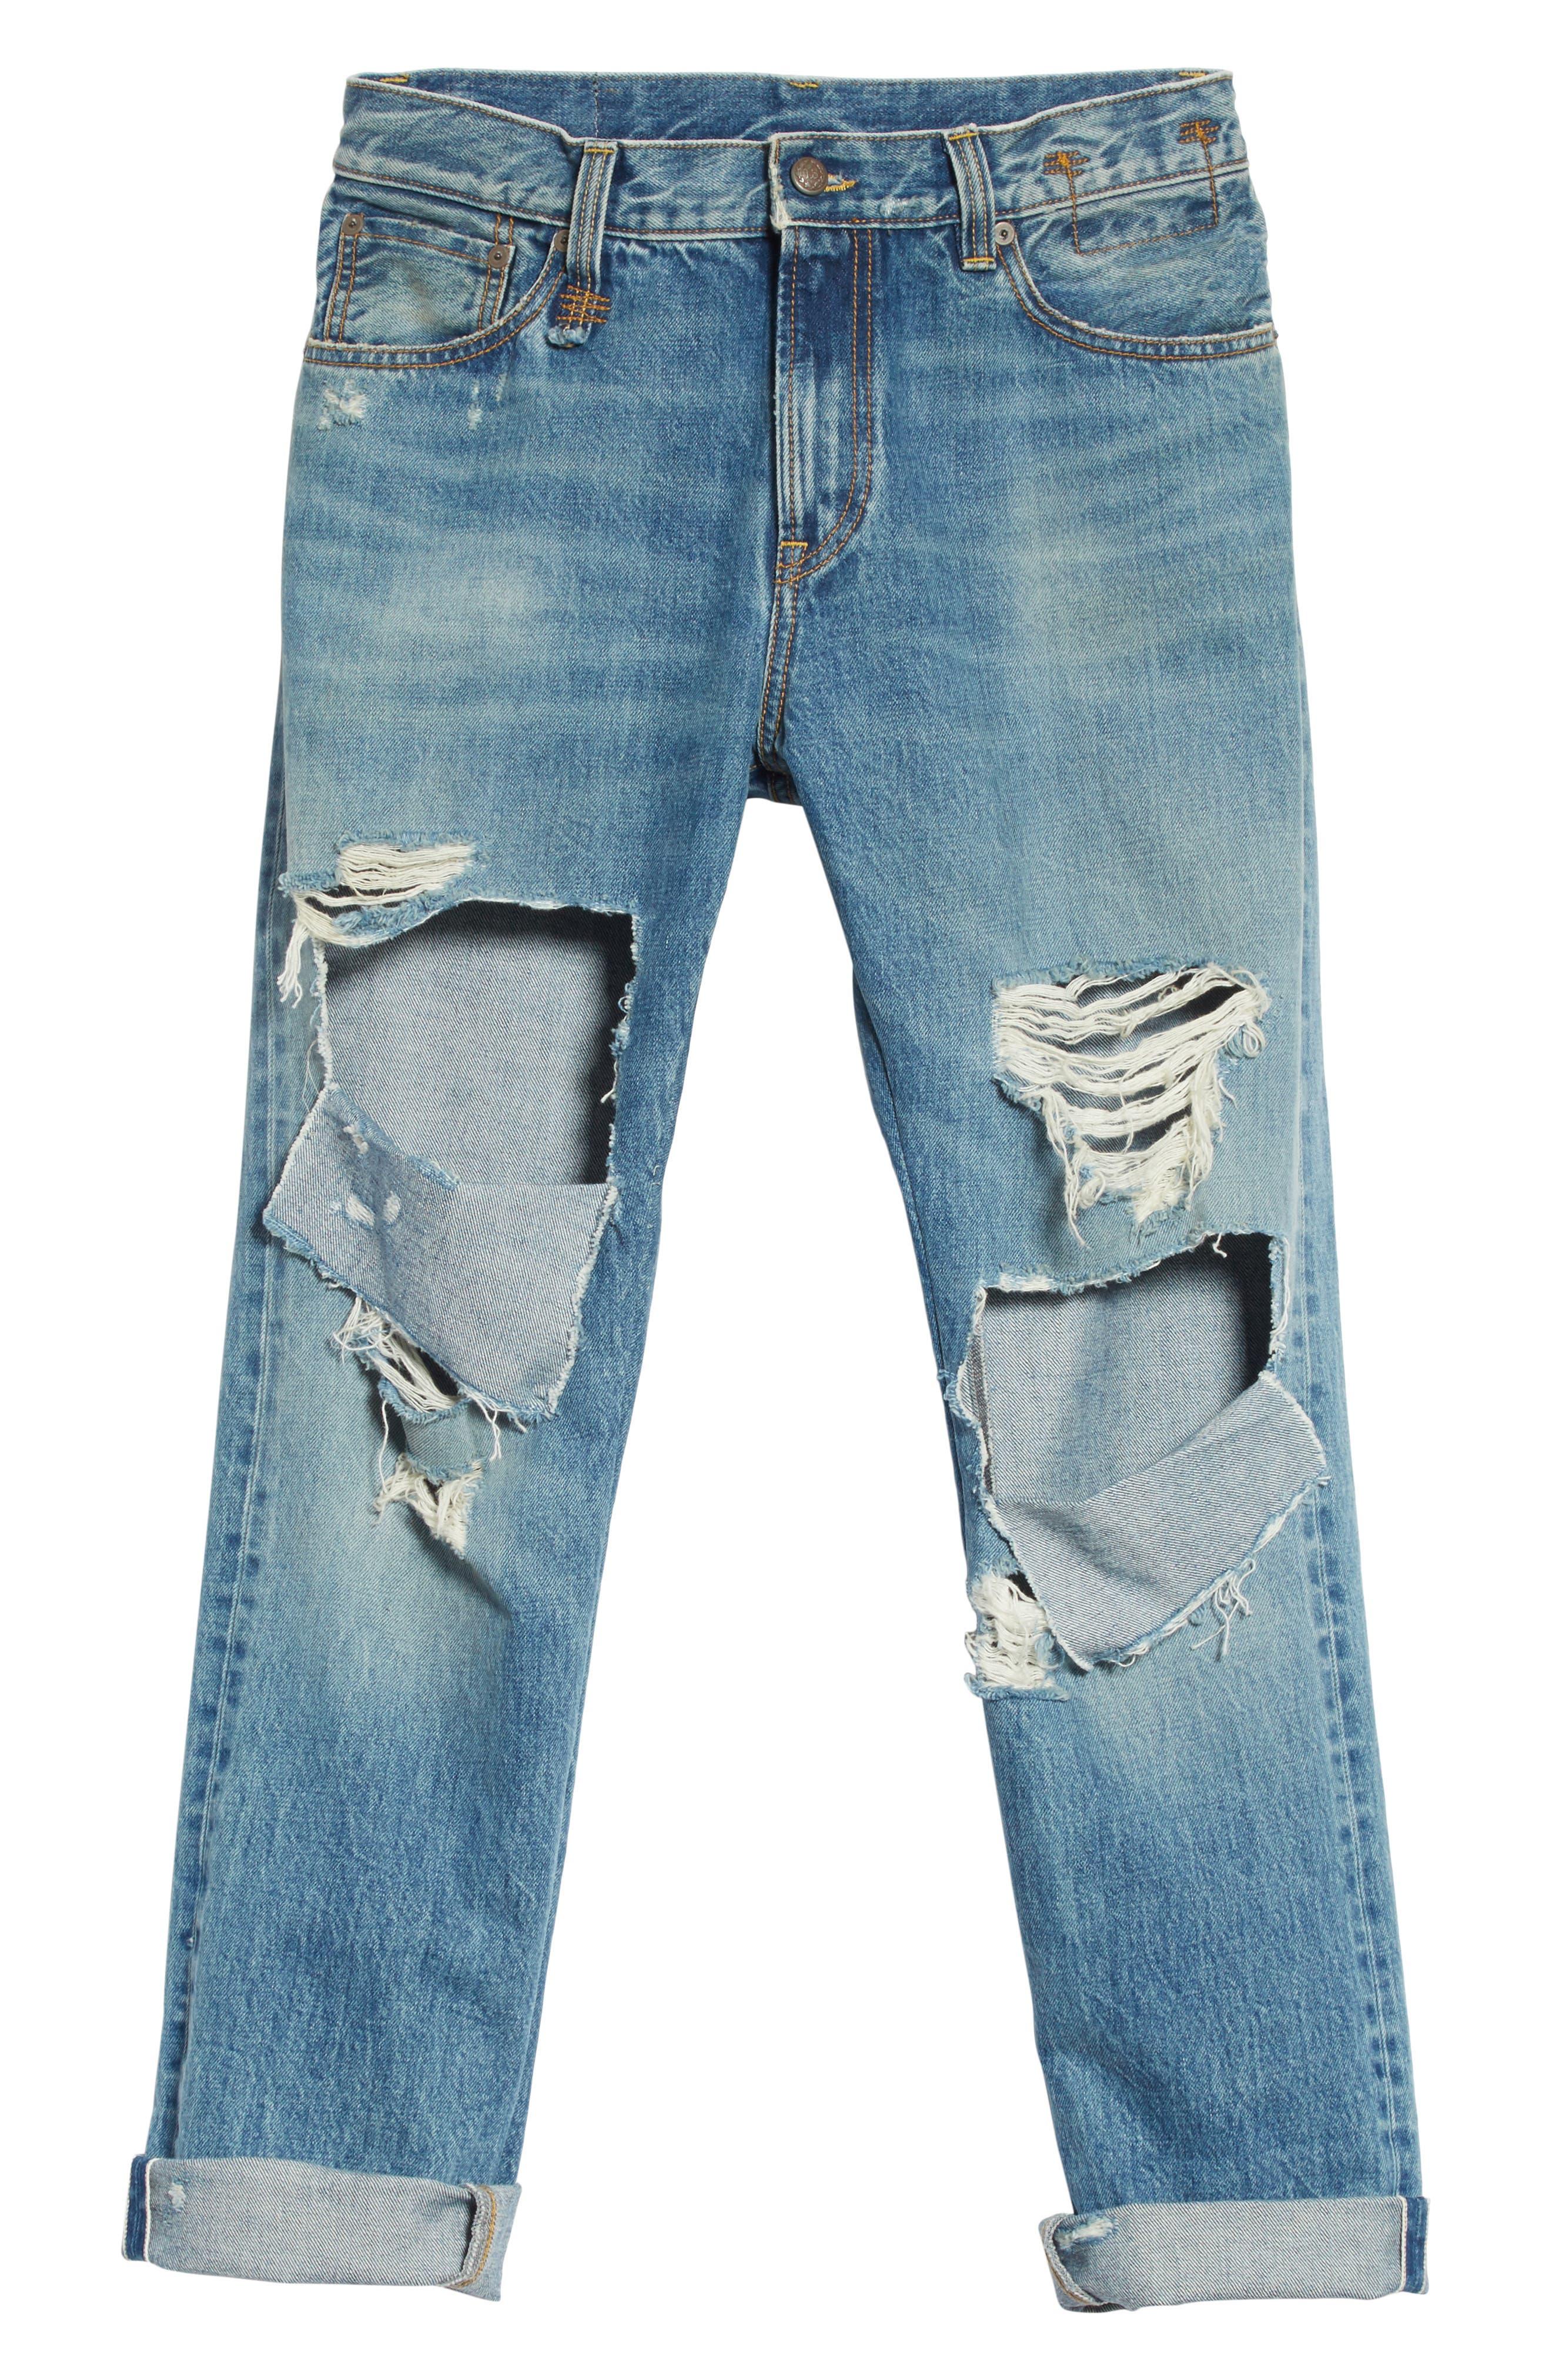 Sid Distressed Cutoff Straight Leg Jeans,                             Alternate thumbnail 6, color,                             Jasper Selvege W Rips